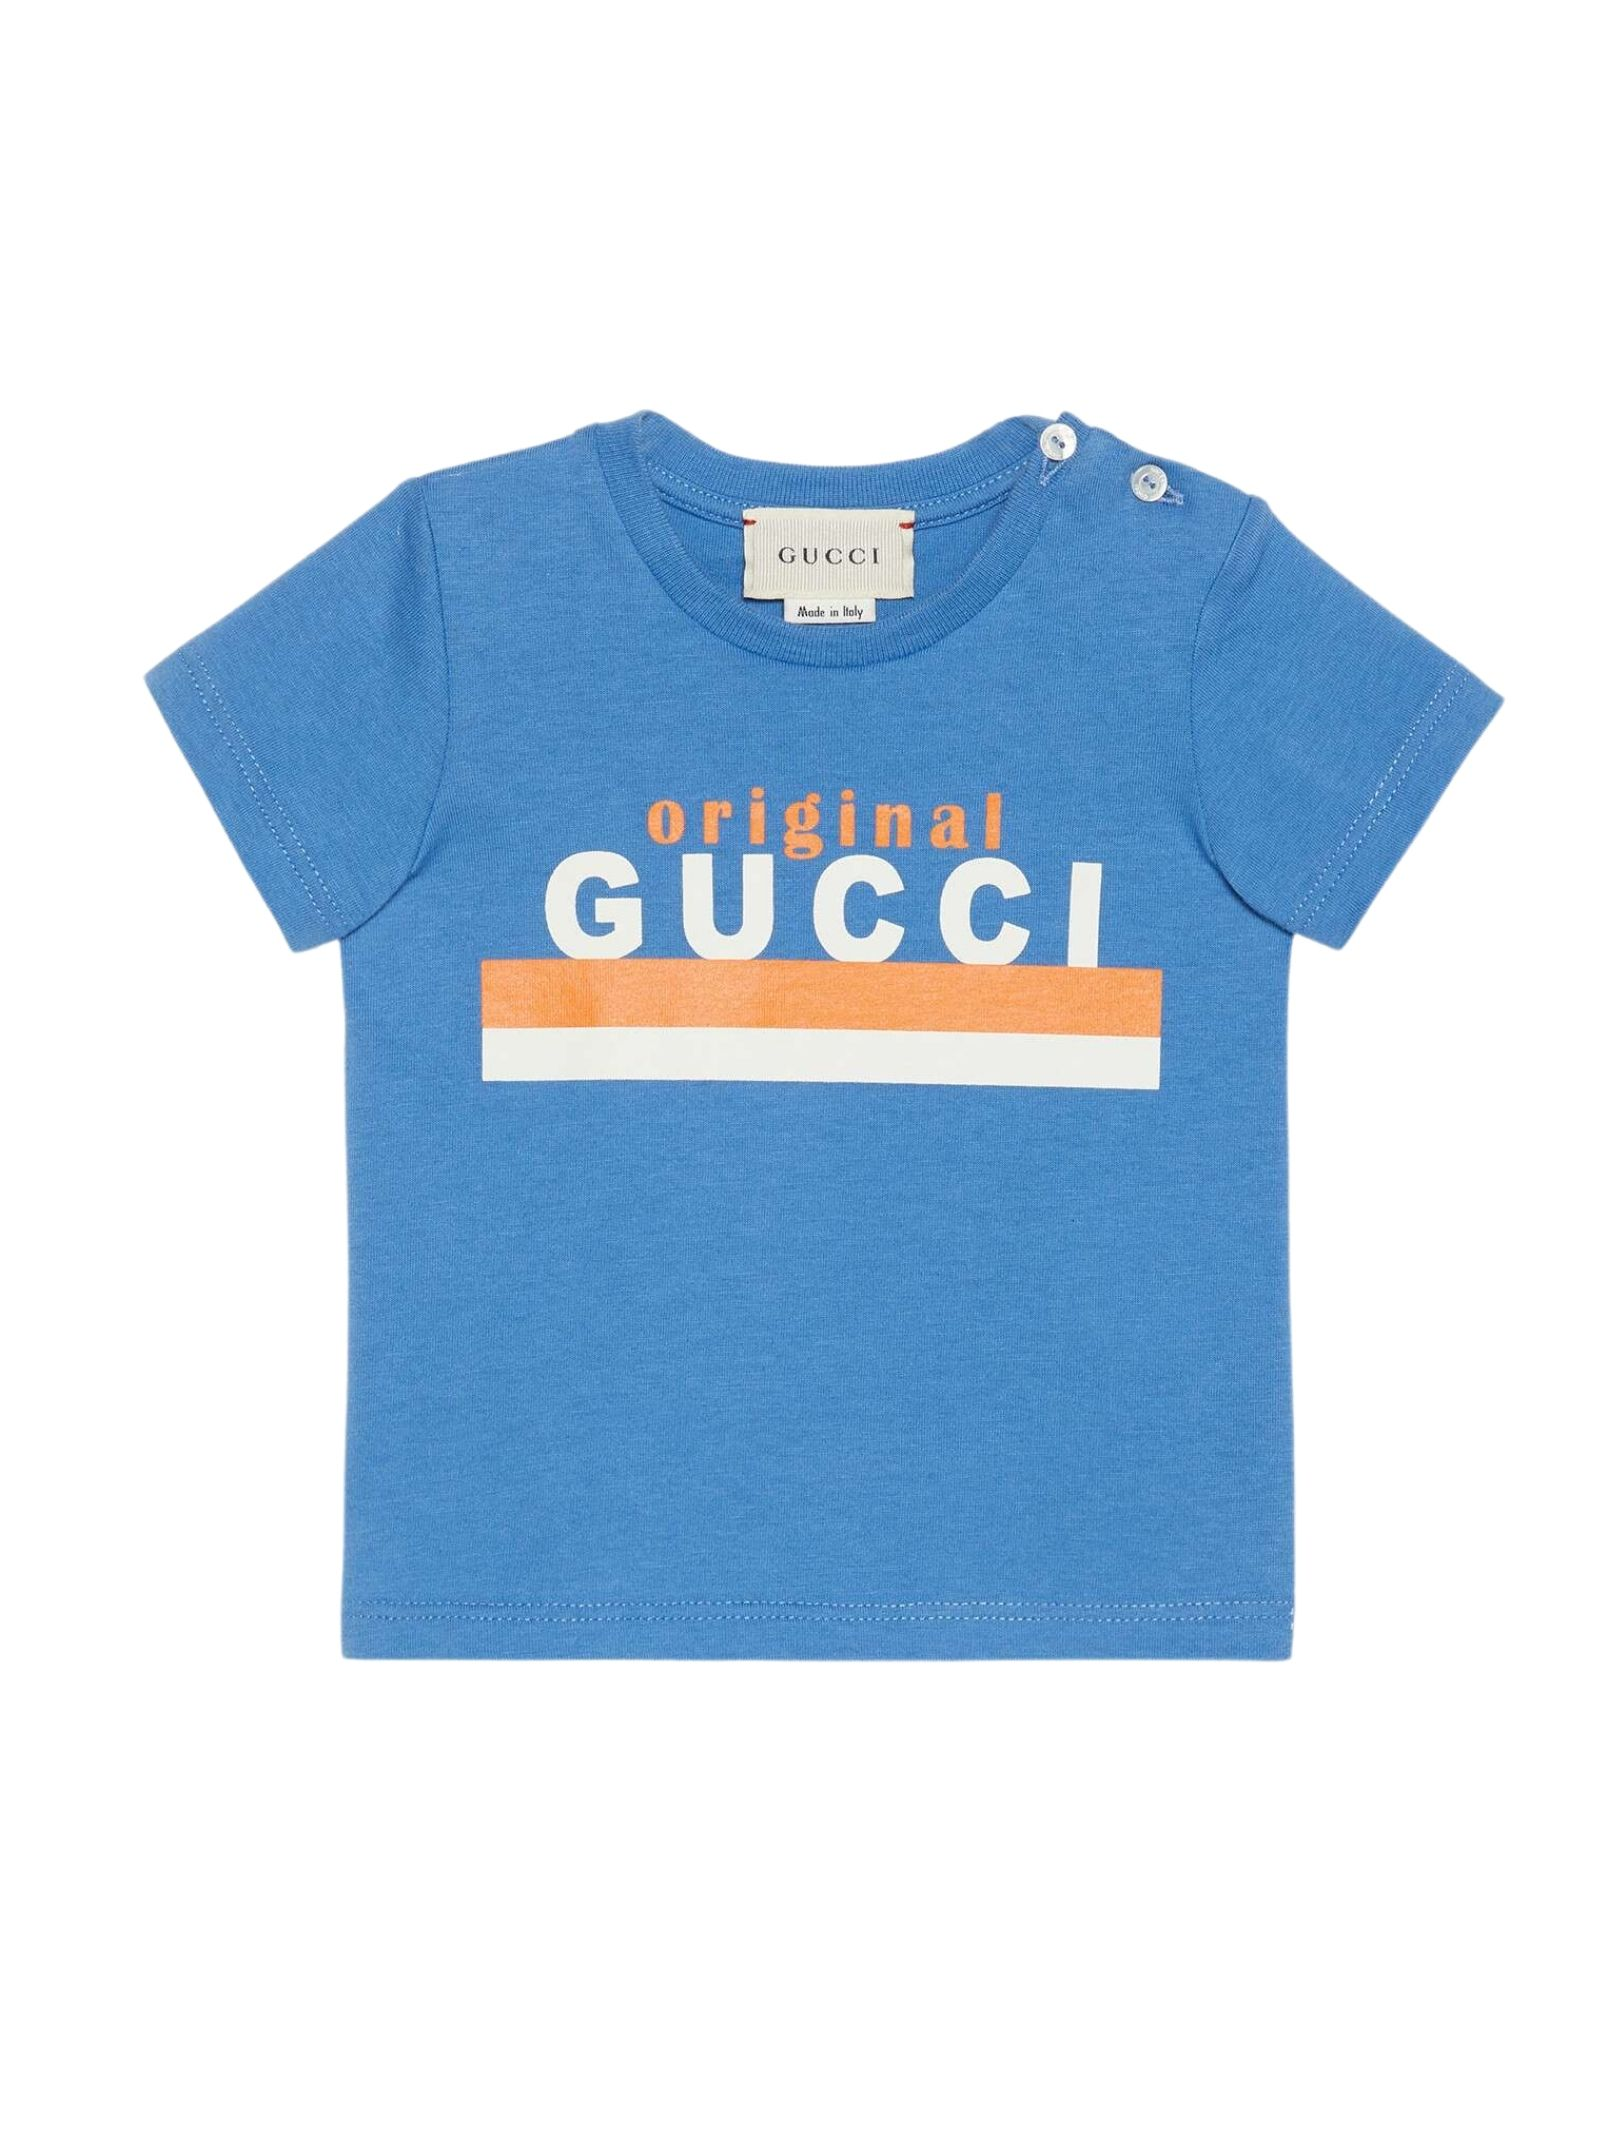 Gucci   T-shirt   548034 XJC7M4093